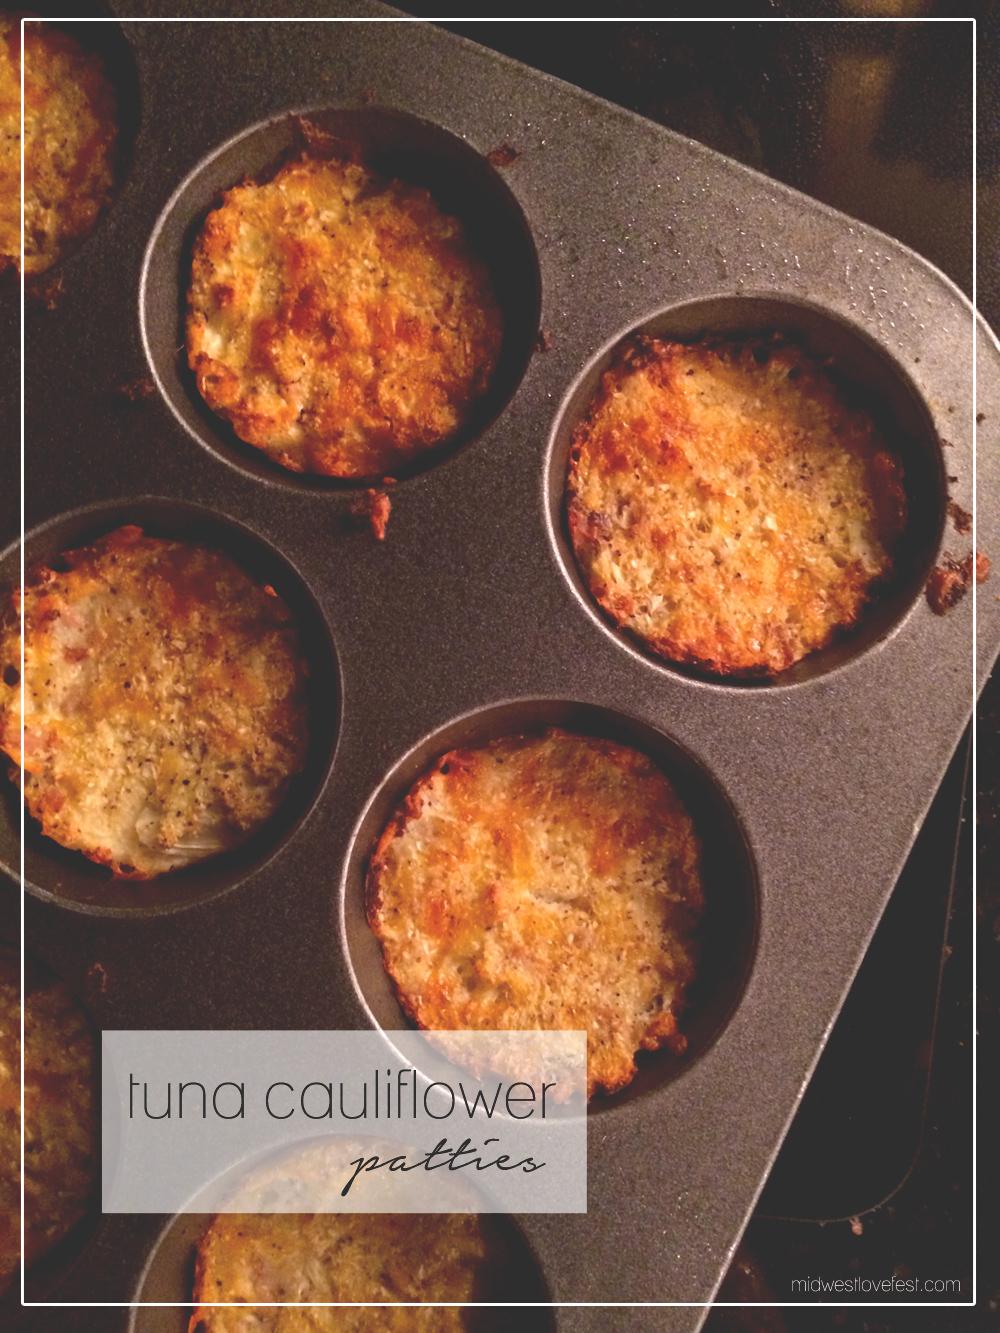 tuna cauliflower patty recipe